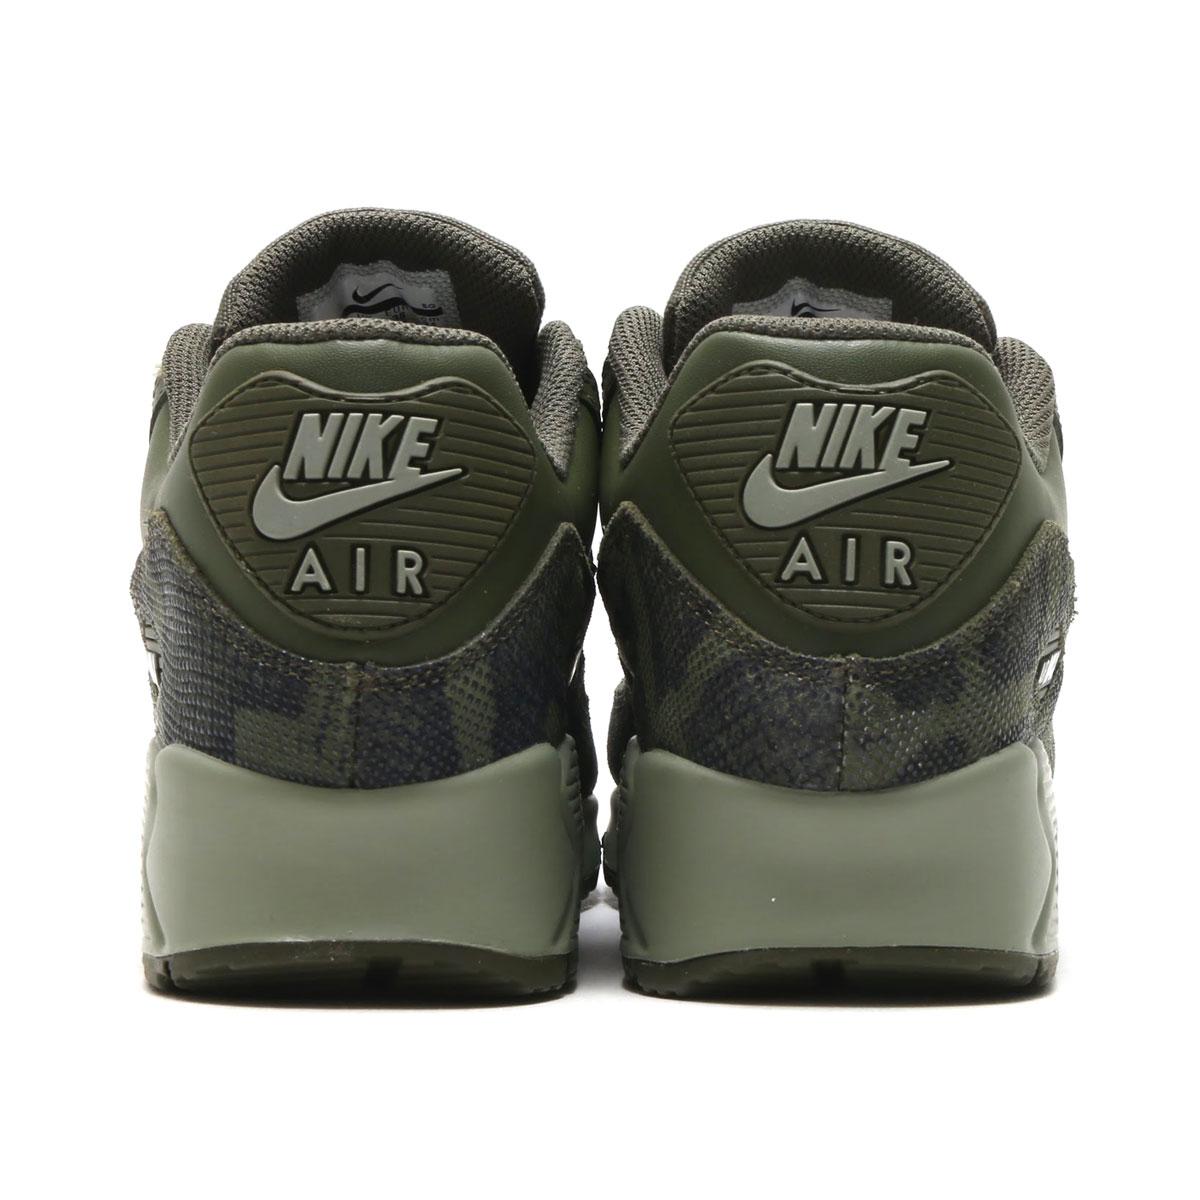 Lifestyle – Nike Air Max 90 Premium Womens Cargo KhakiCargo KhakiDark StuccoCargo Khaki